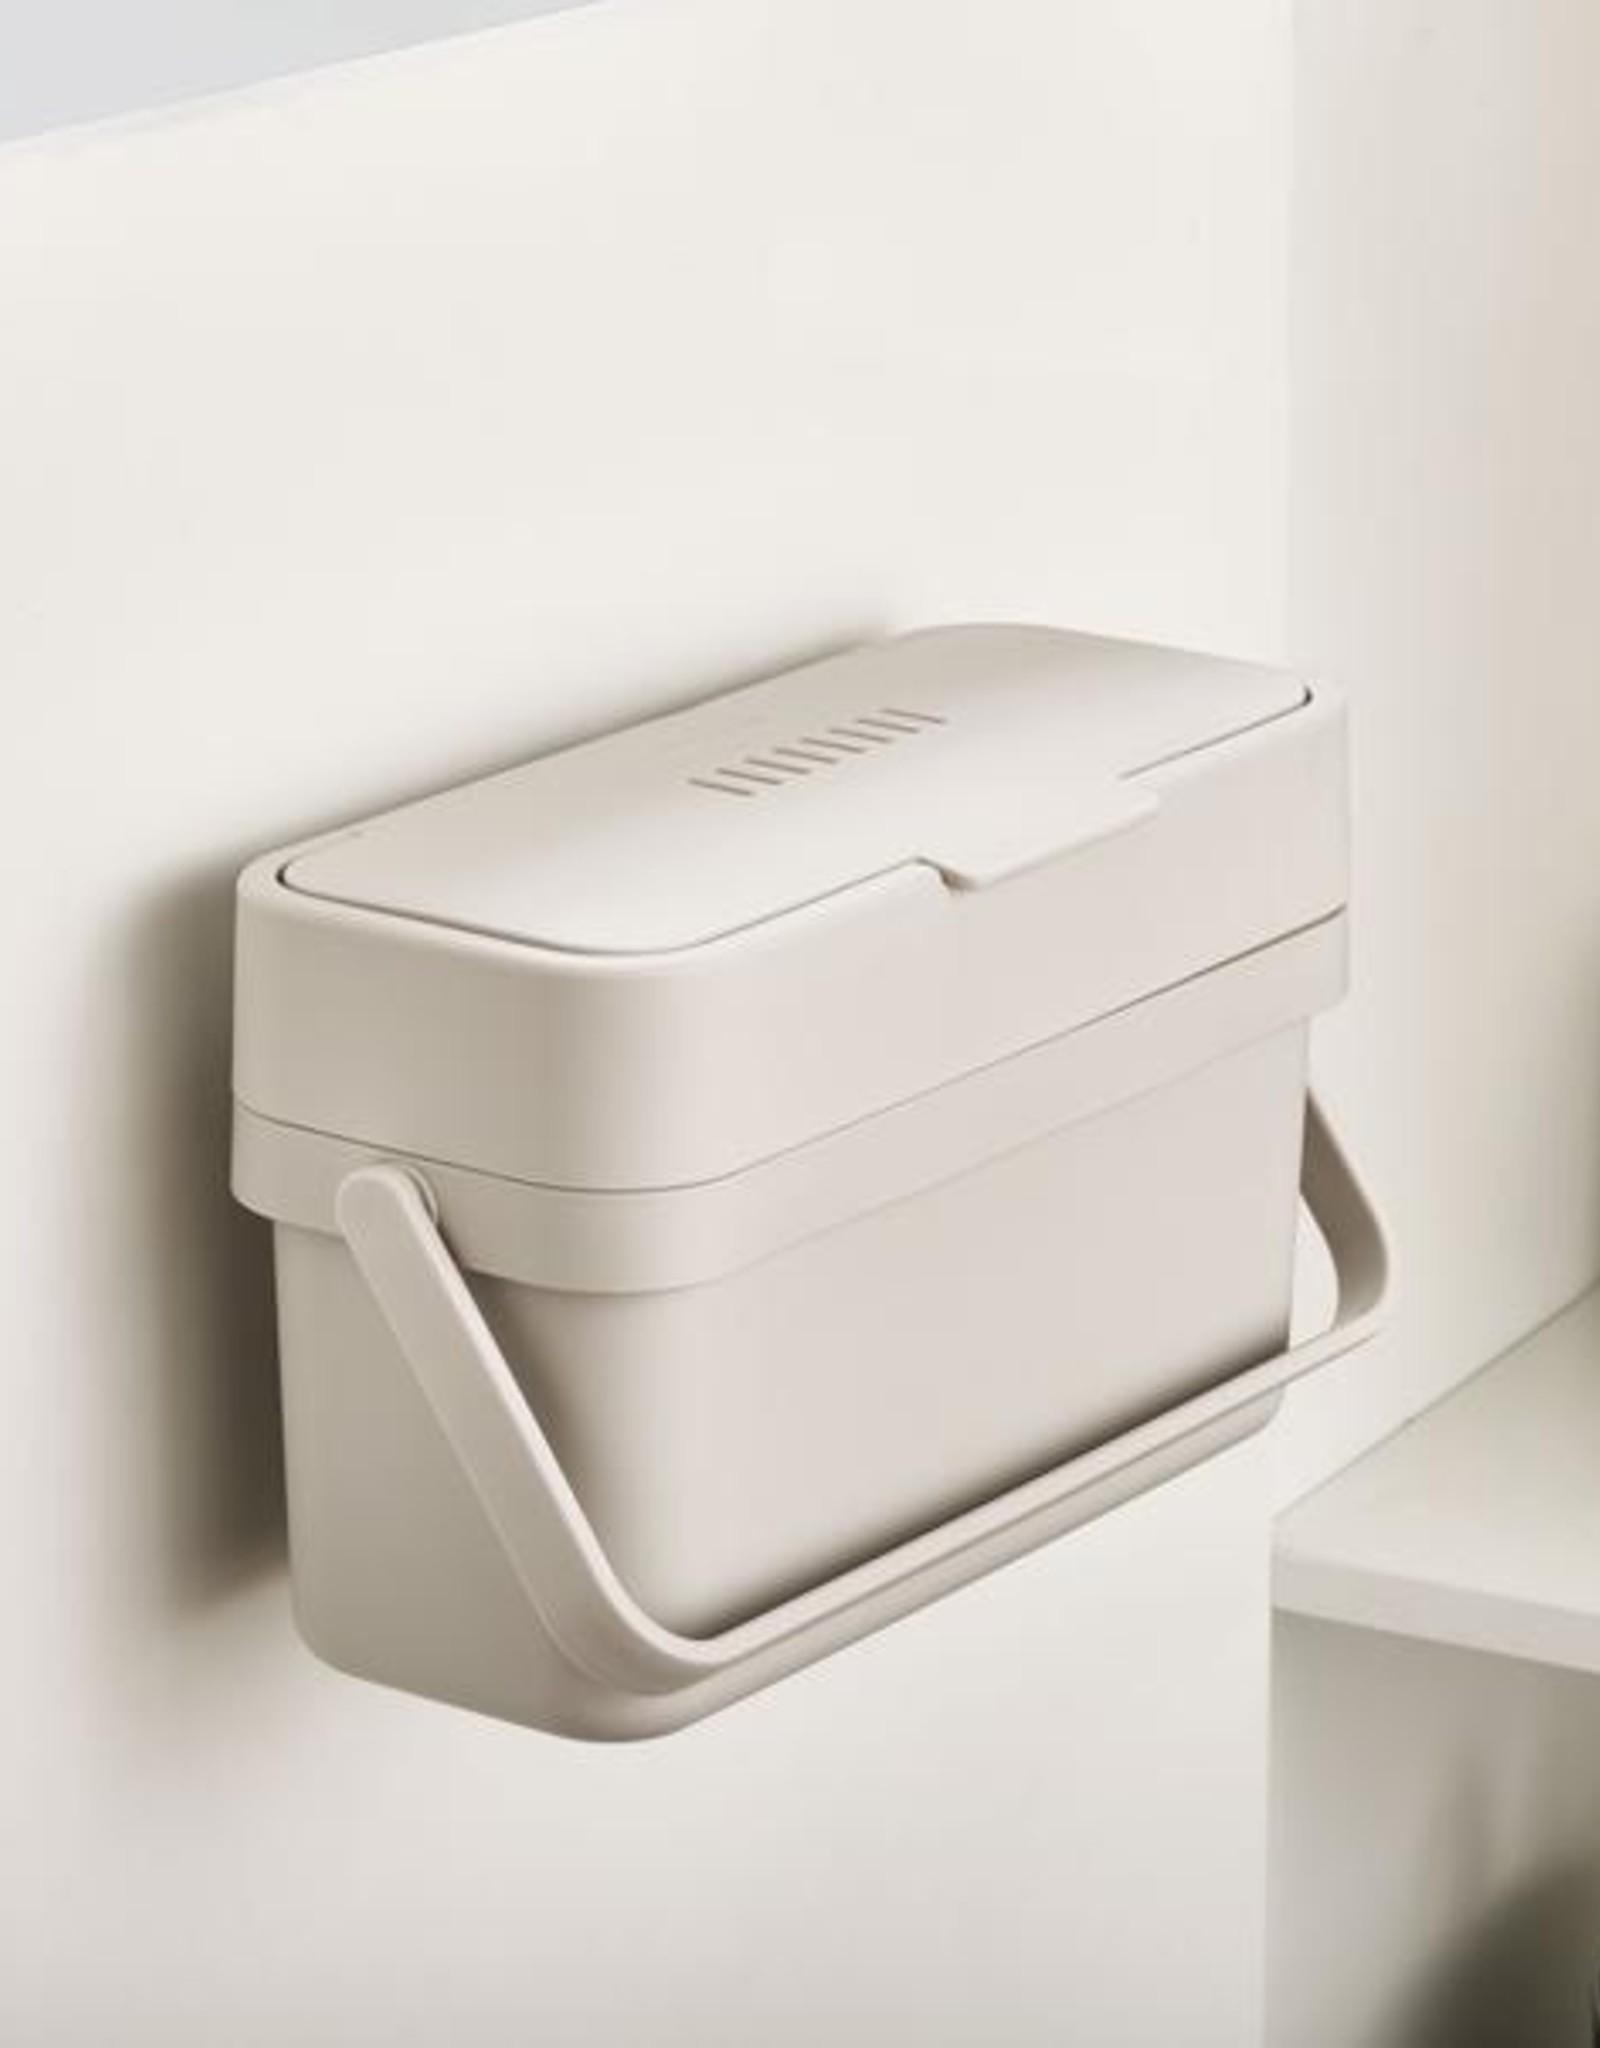 JJ Food Waste Caddy Compost Bin